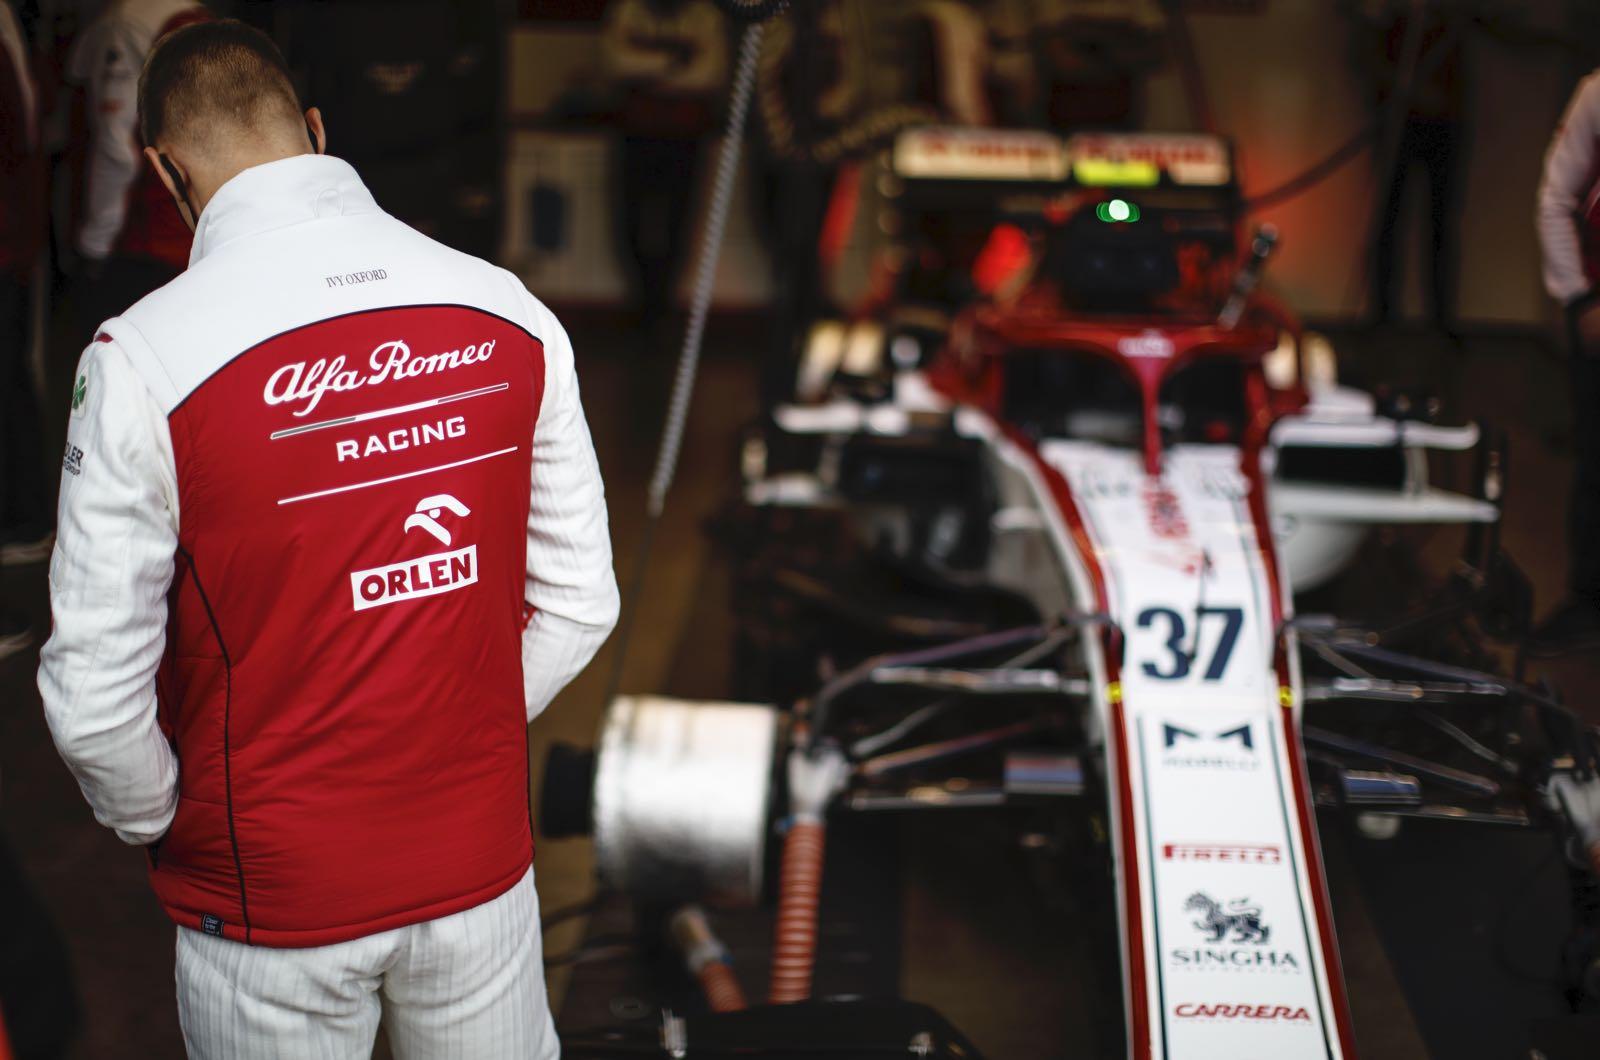 2021 Mick Schumacher Decision Due Soon